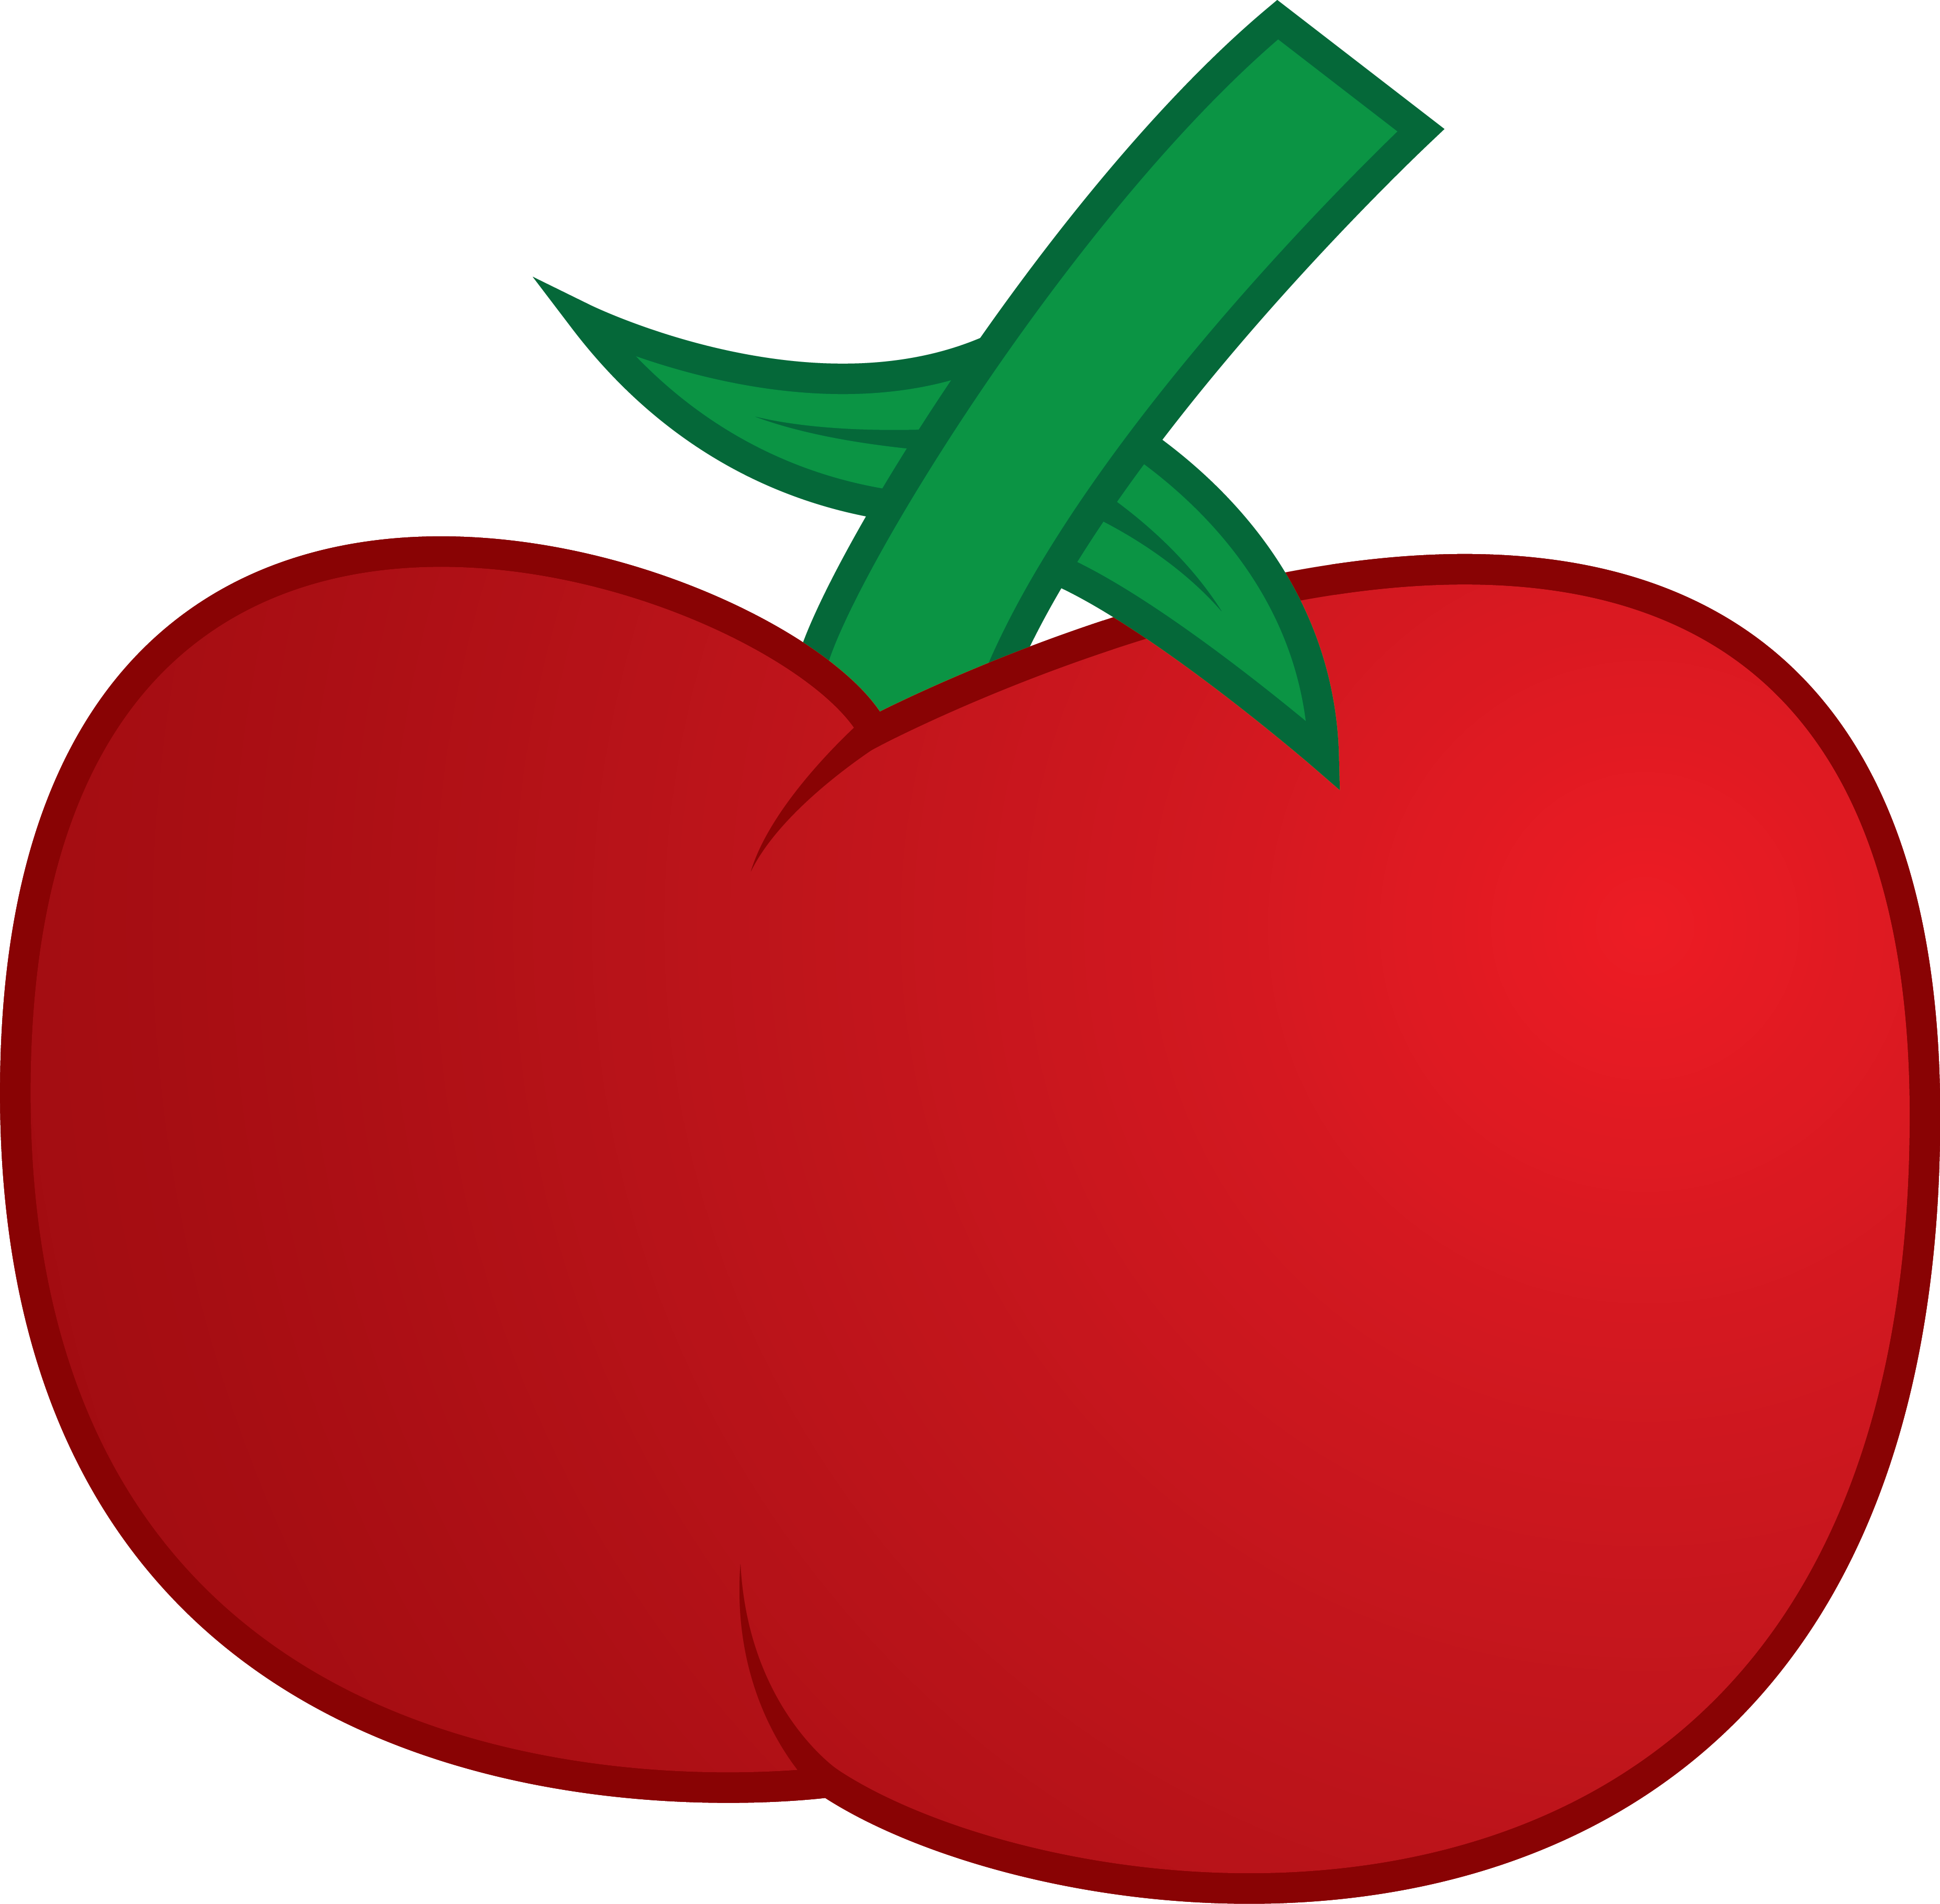 Tomato Cutie Mark by Silentmatten on DeviantArt